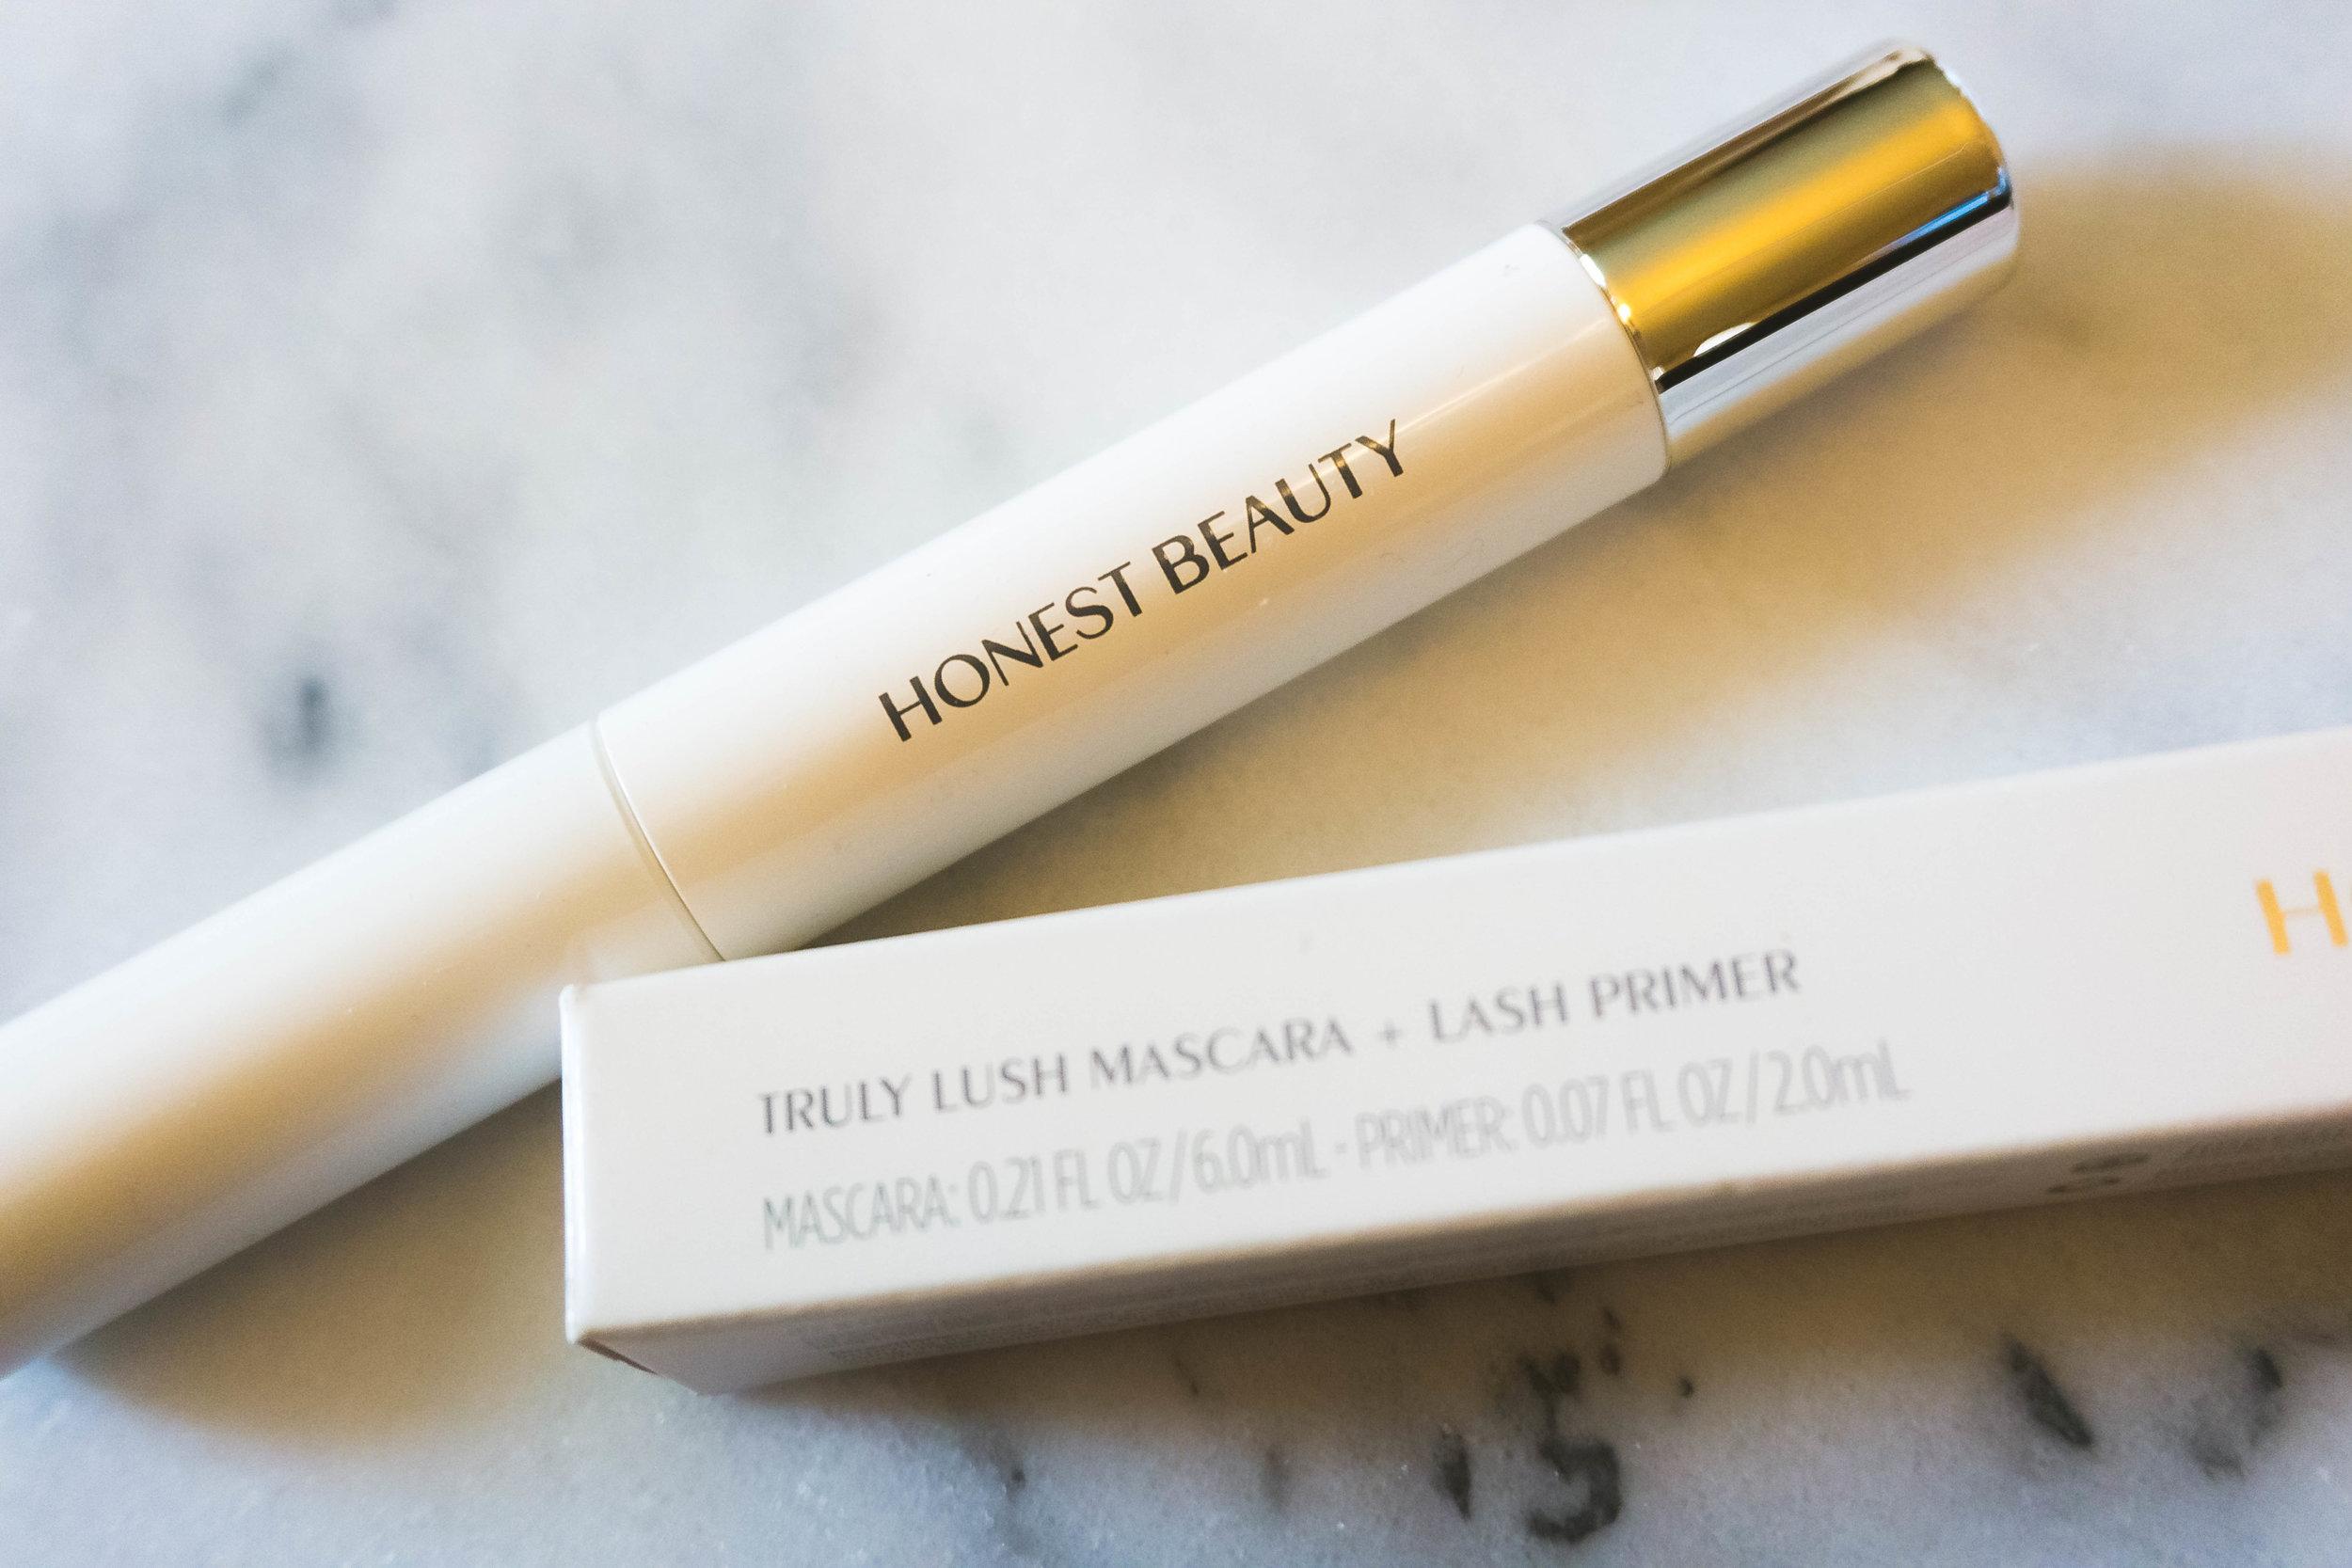 Honest_Beauty_Mascara